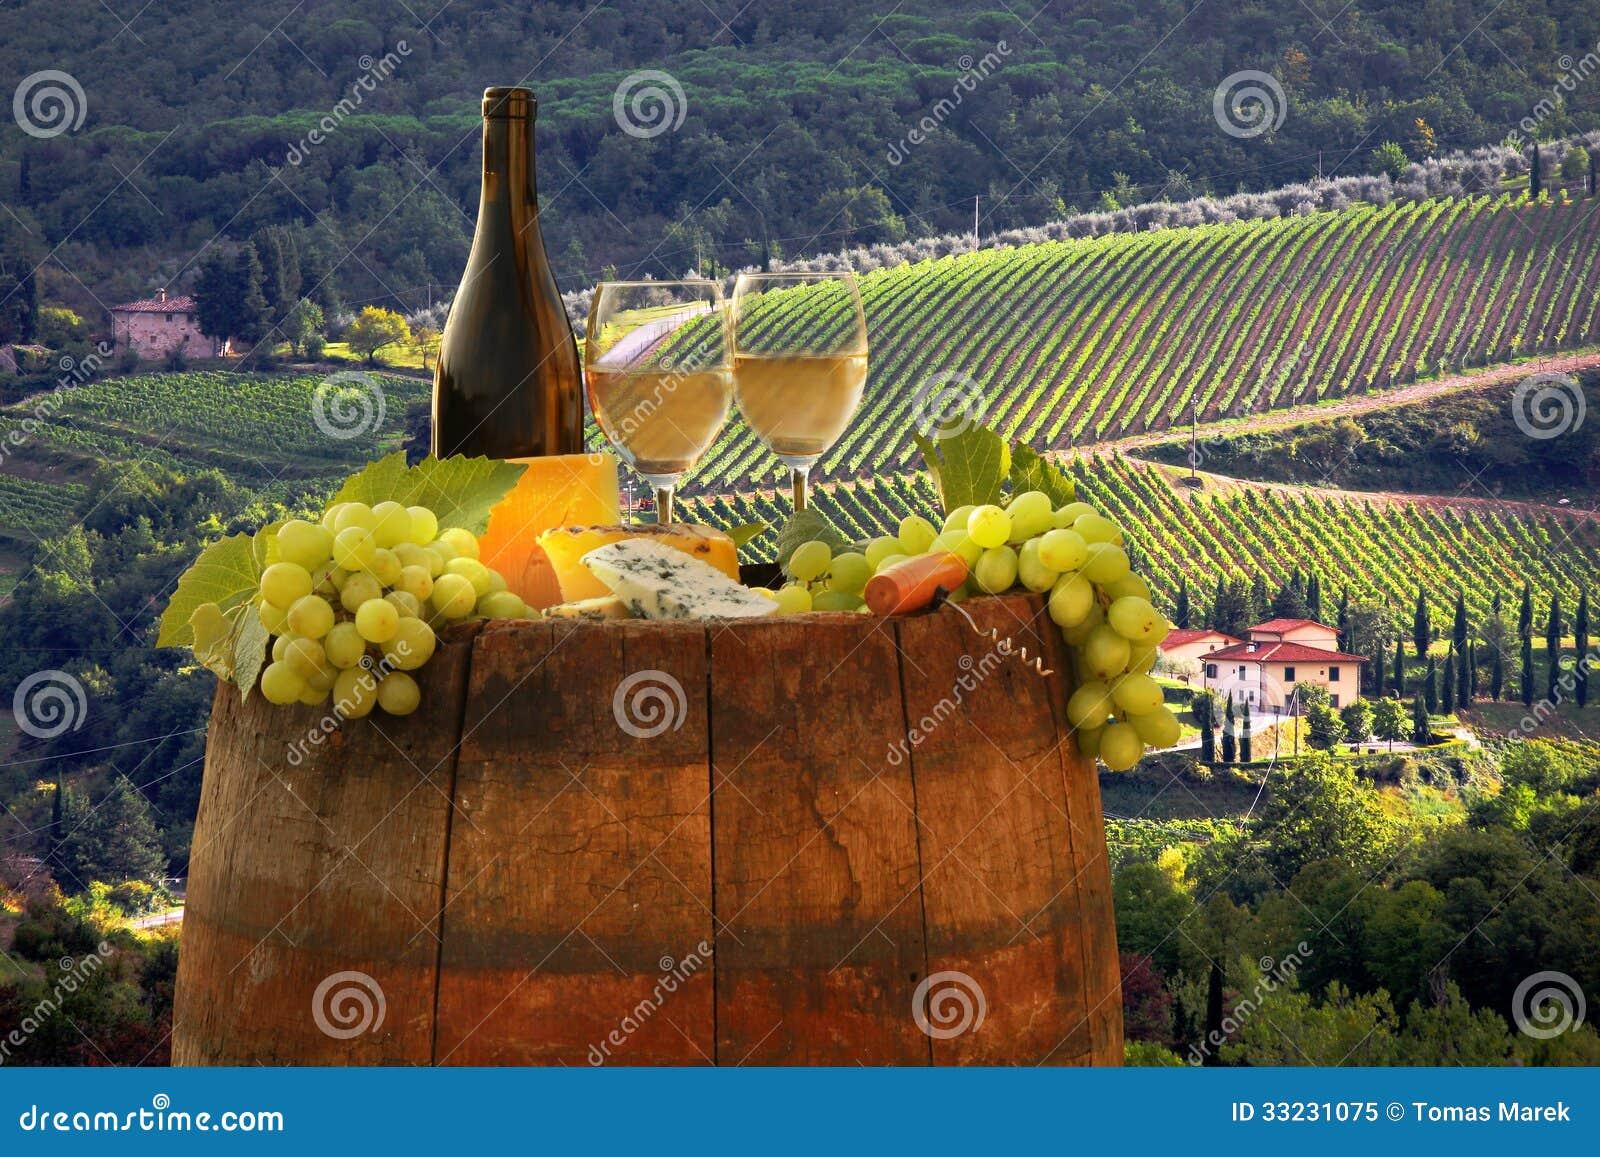 Vineyard in Chianti, Tuscany